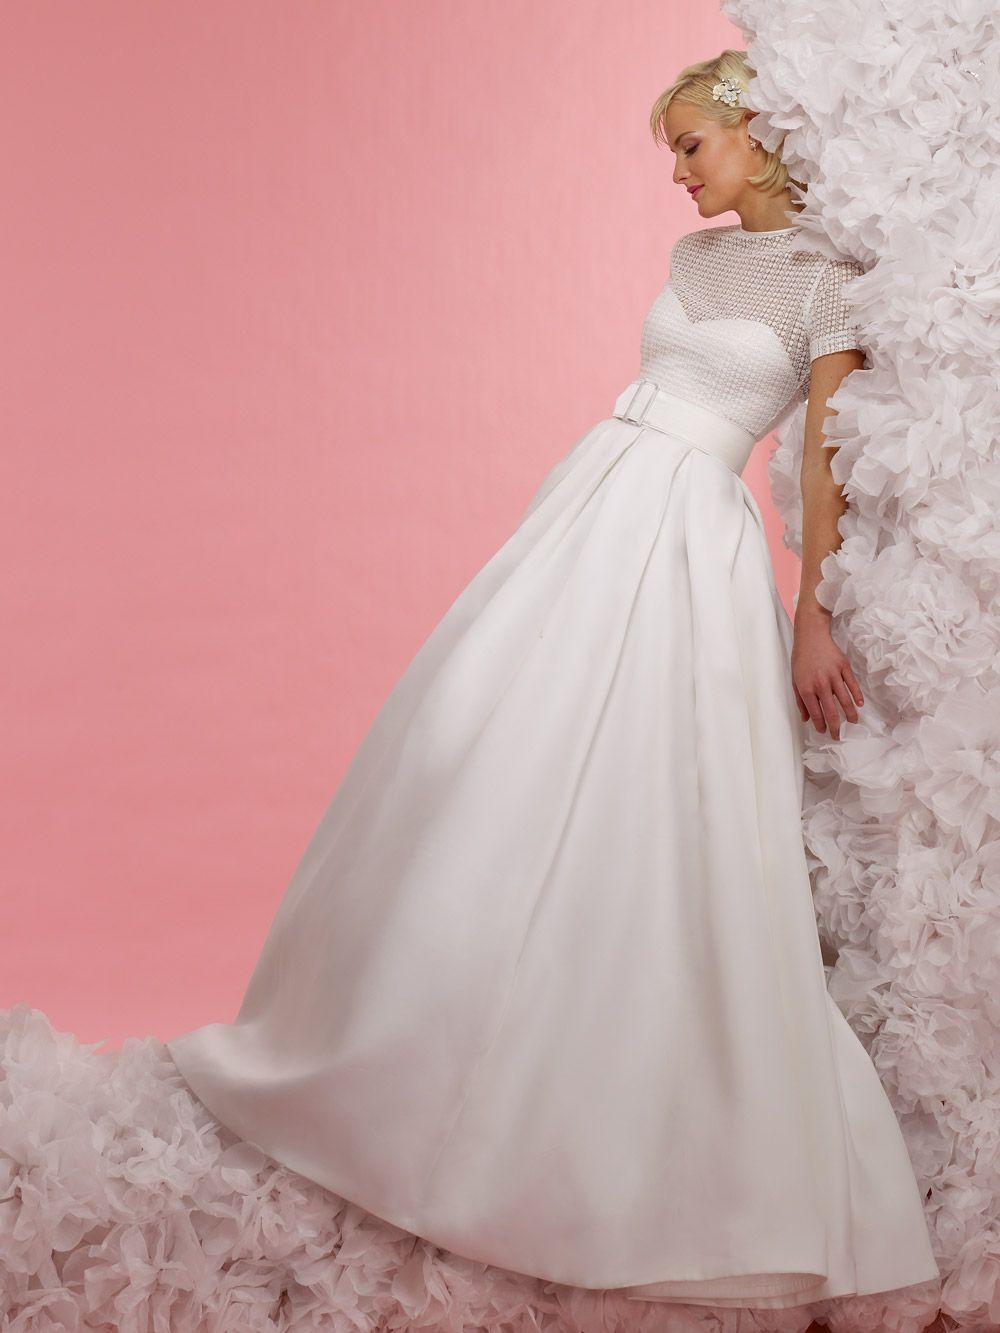 Pin de Laureana Bonaparte en Weddings and Gowns | Pinterest | Traje ...